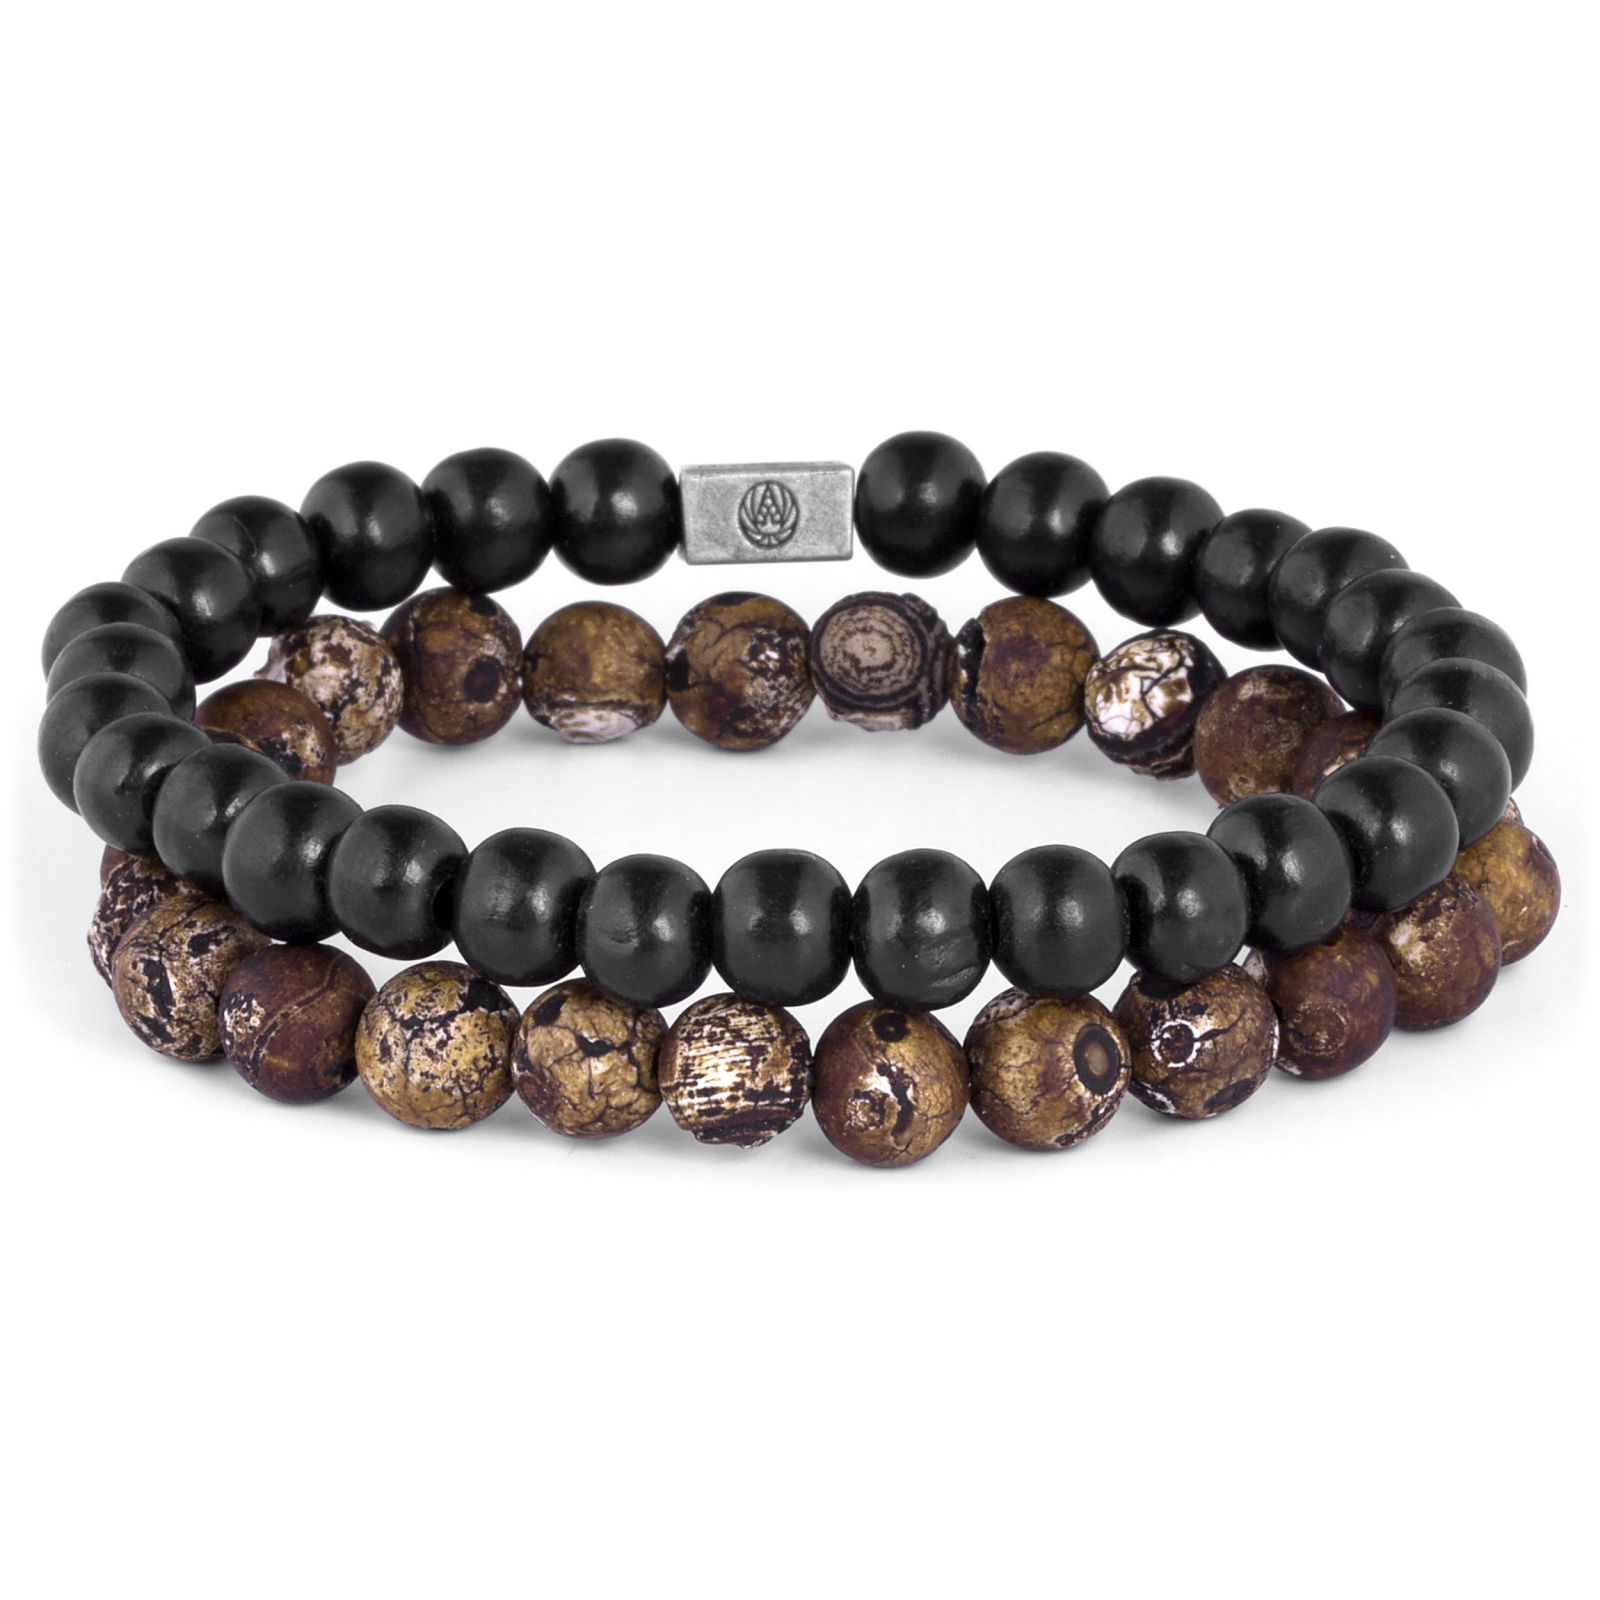 Black Wooden Pearl Necklace Trendhim JtJ6Xy